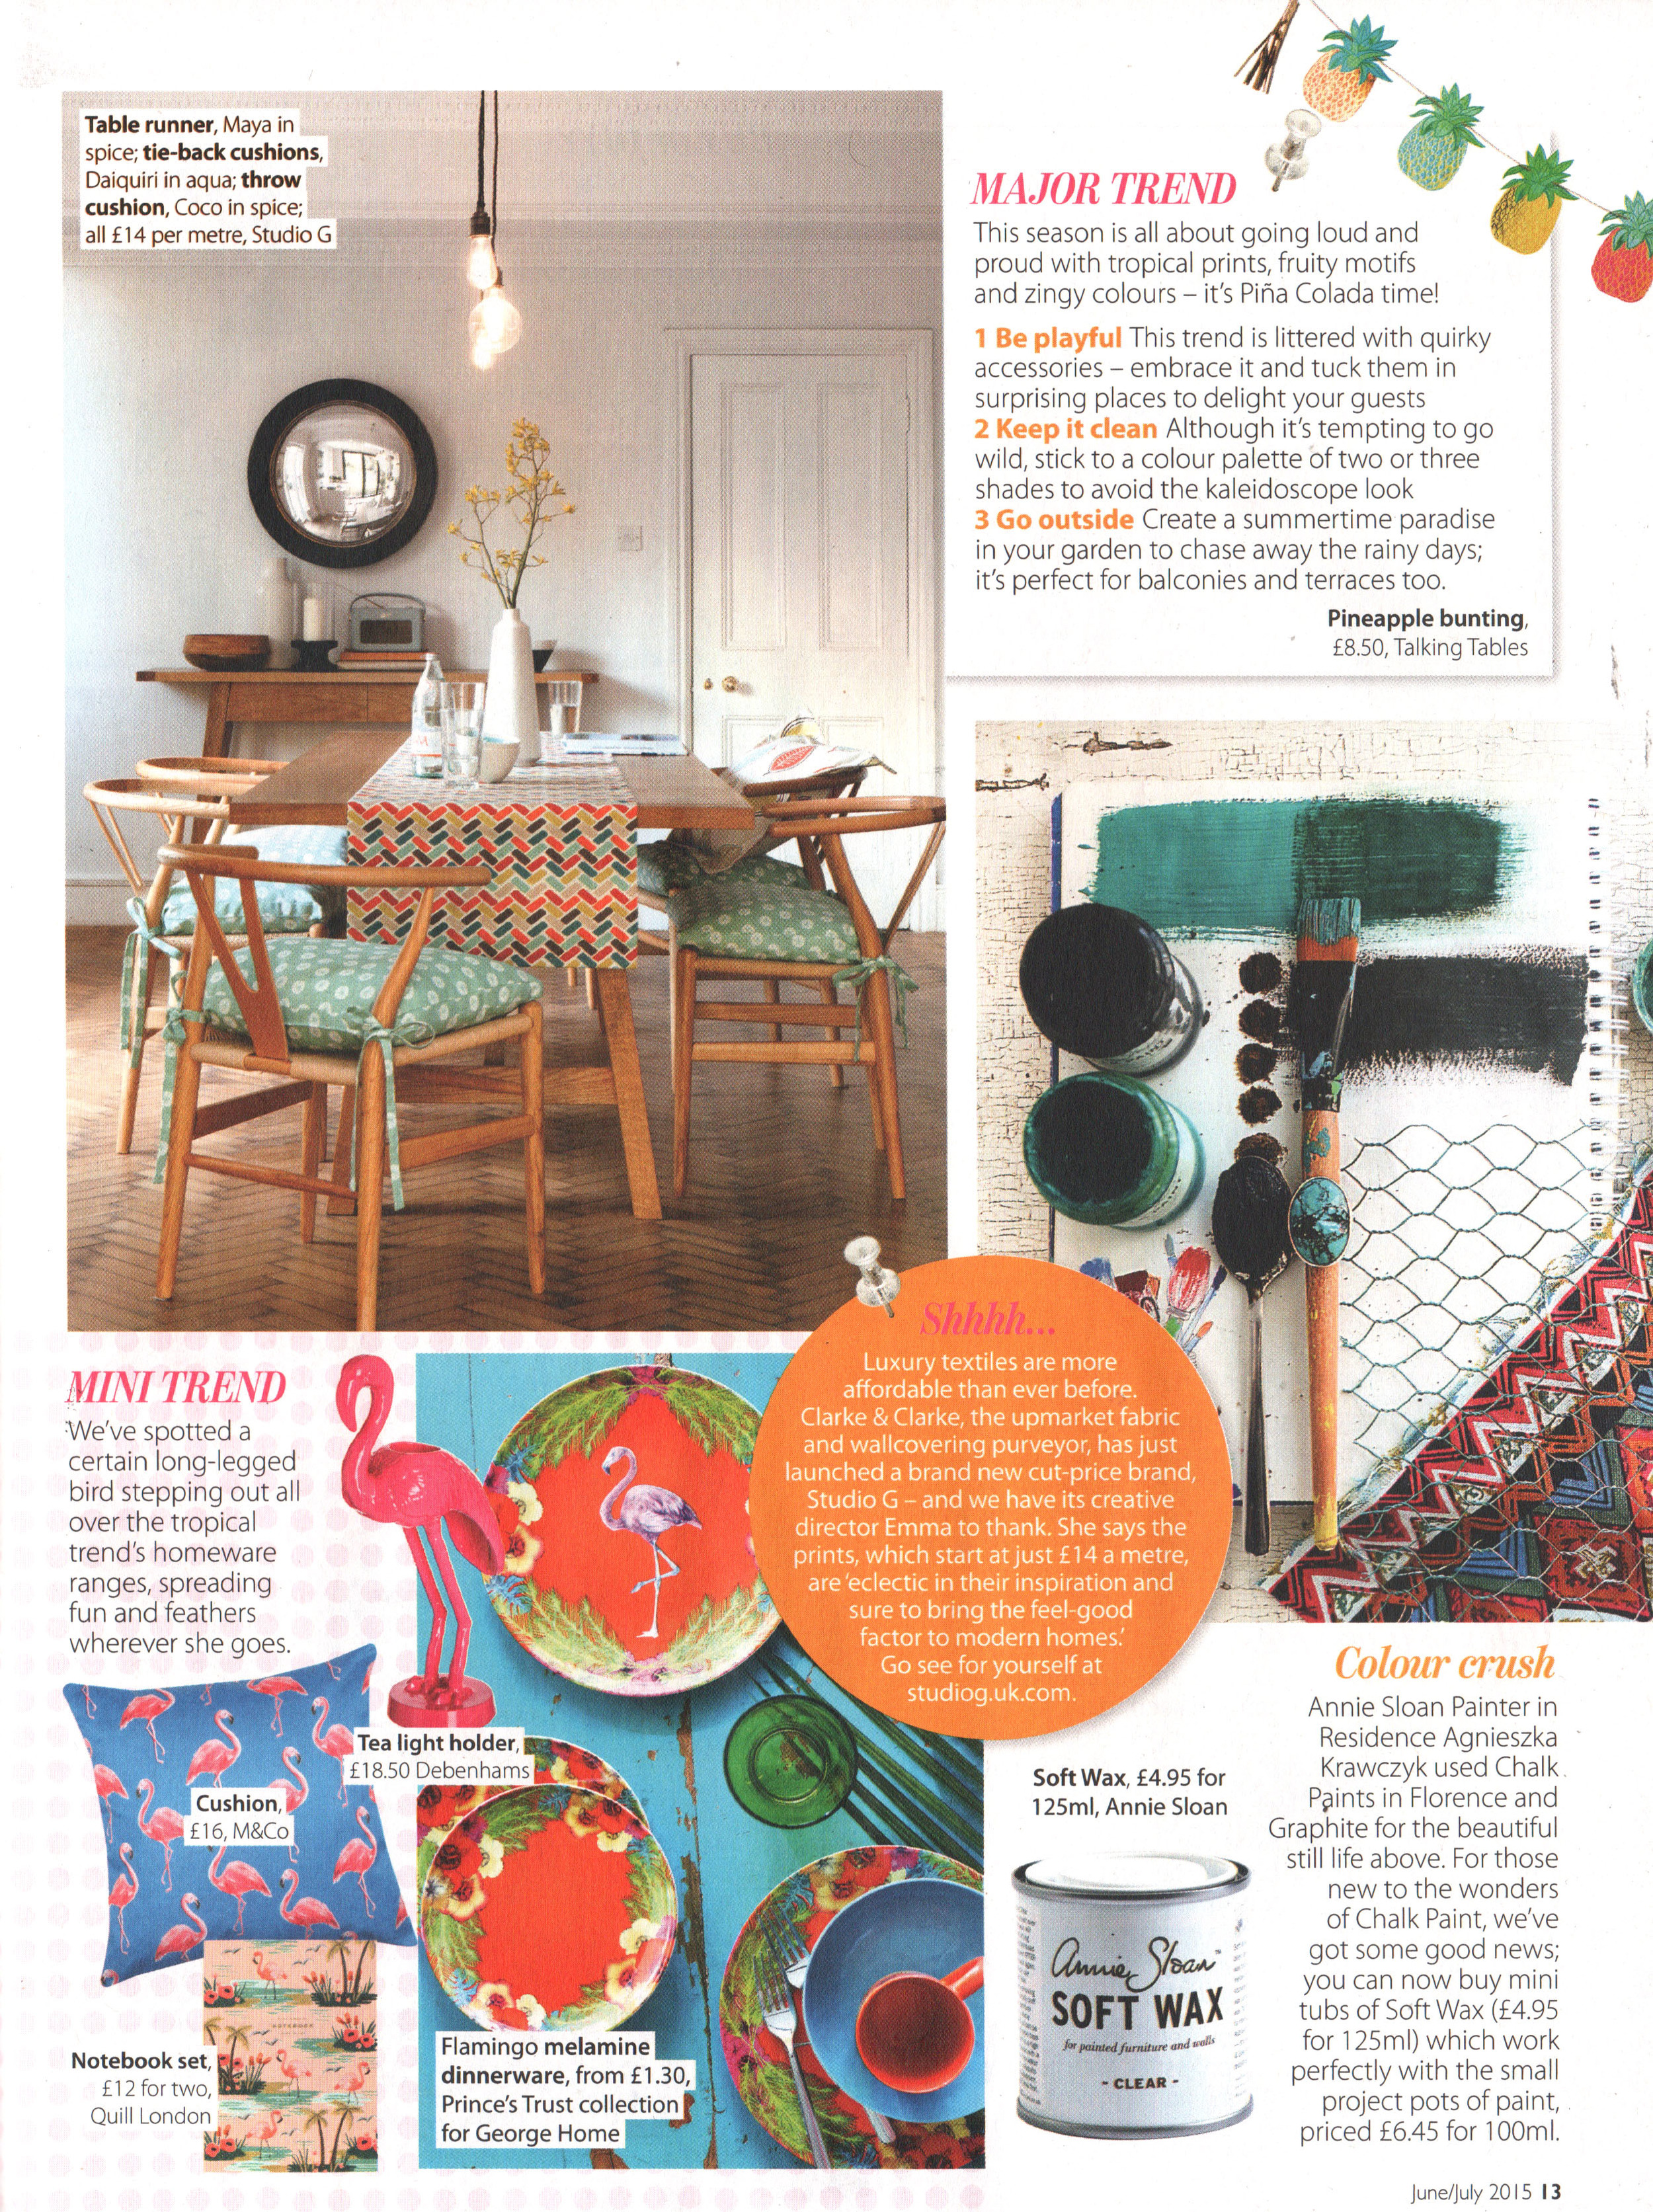 Homestyle Magazine, June/July 2015